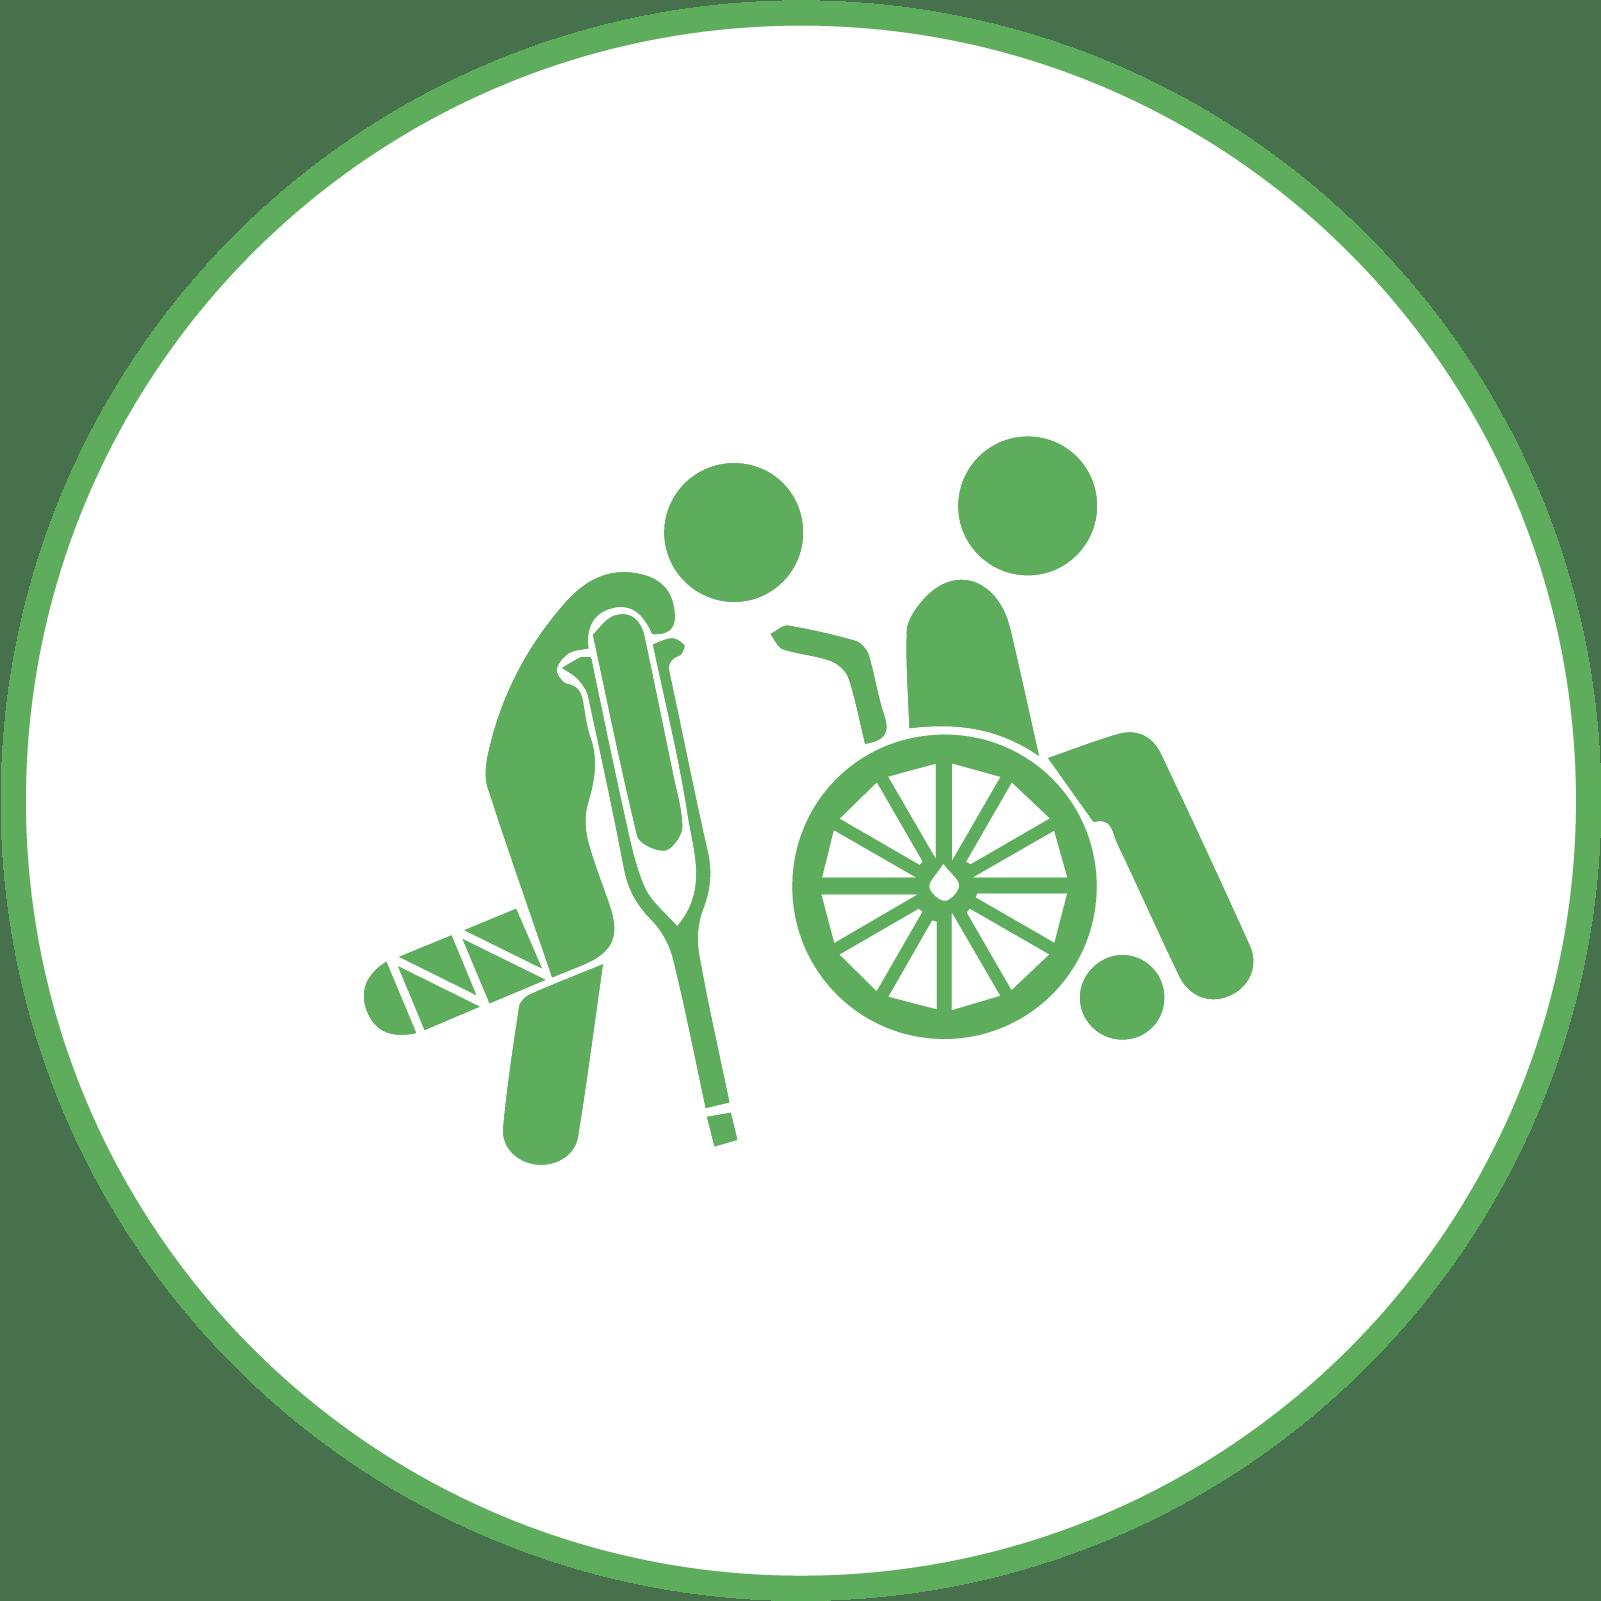 Disabled/Medical case passengers